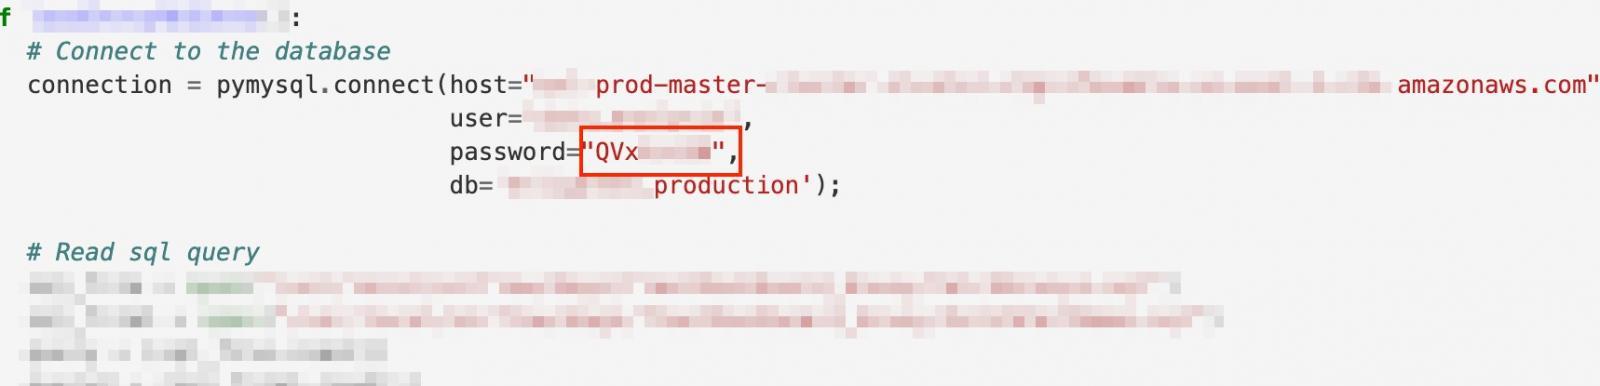 production environment credentials leak